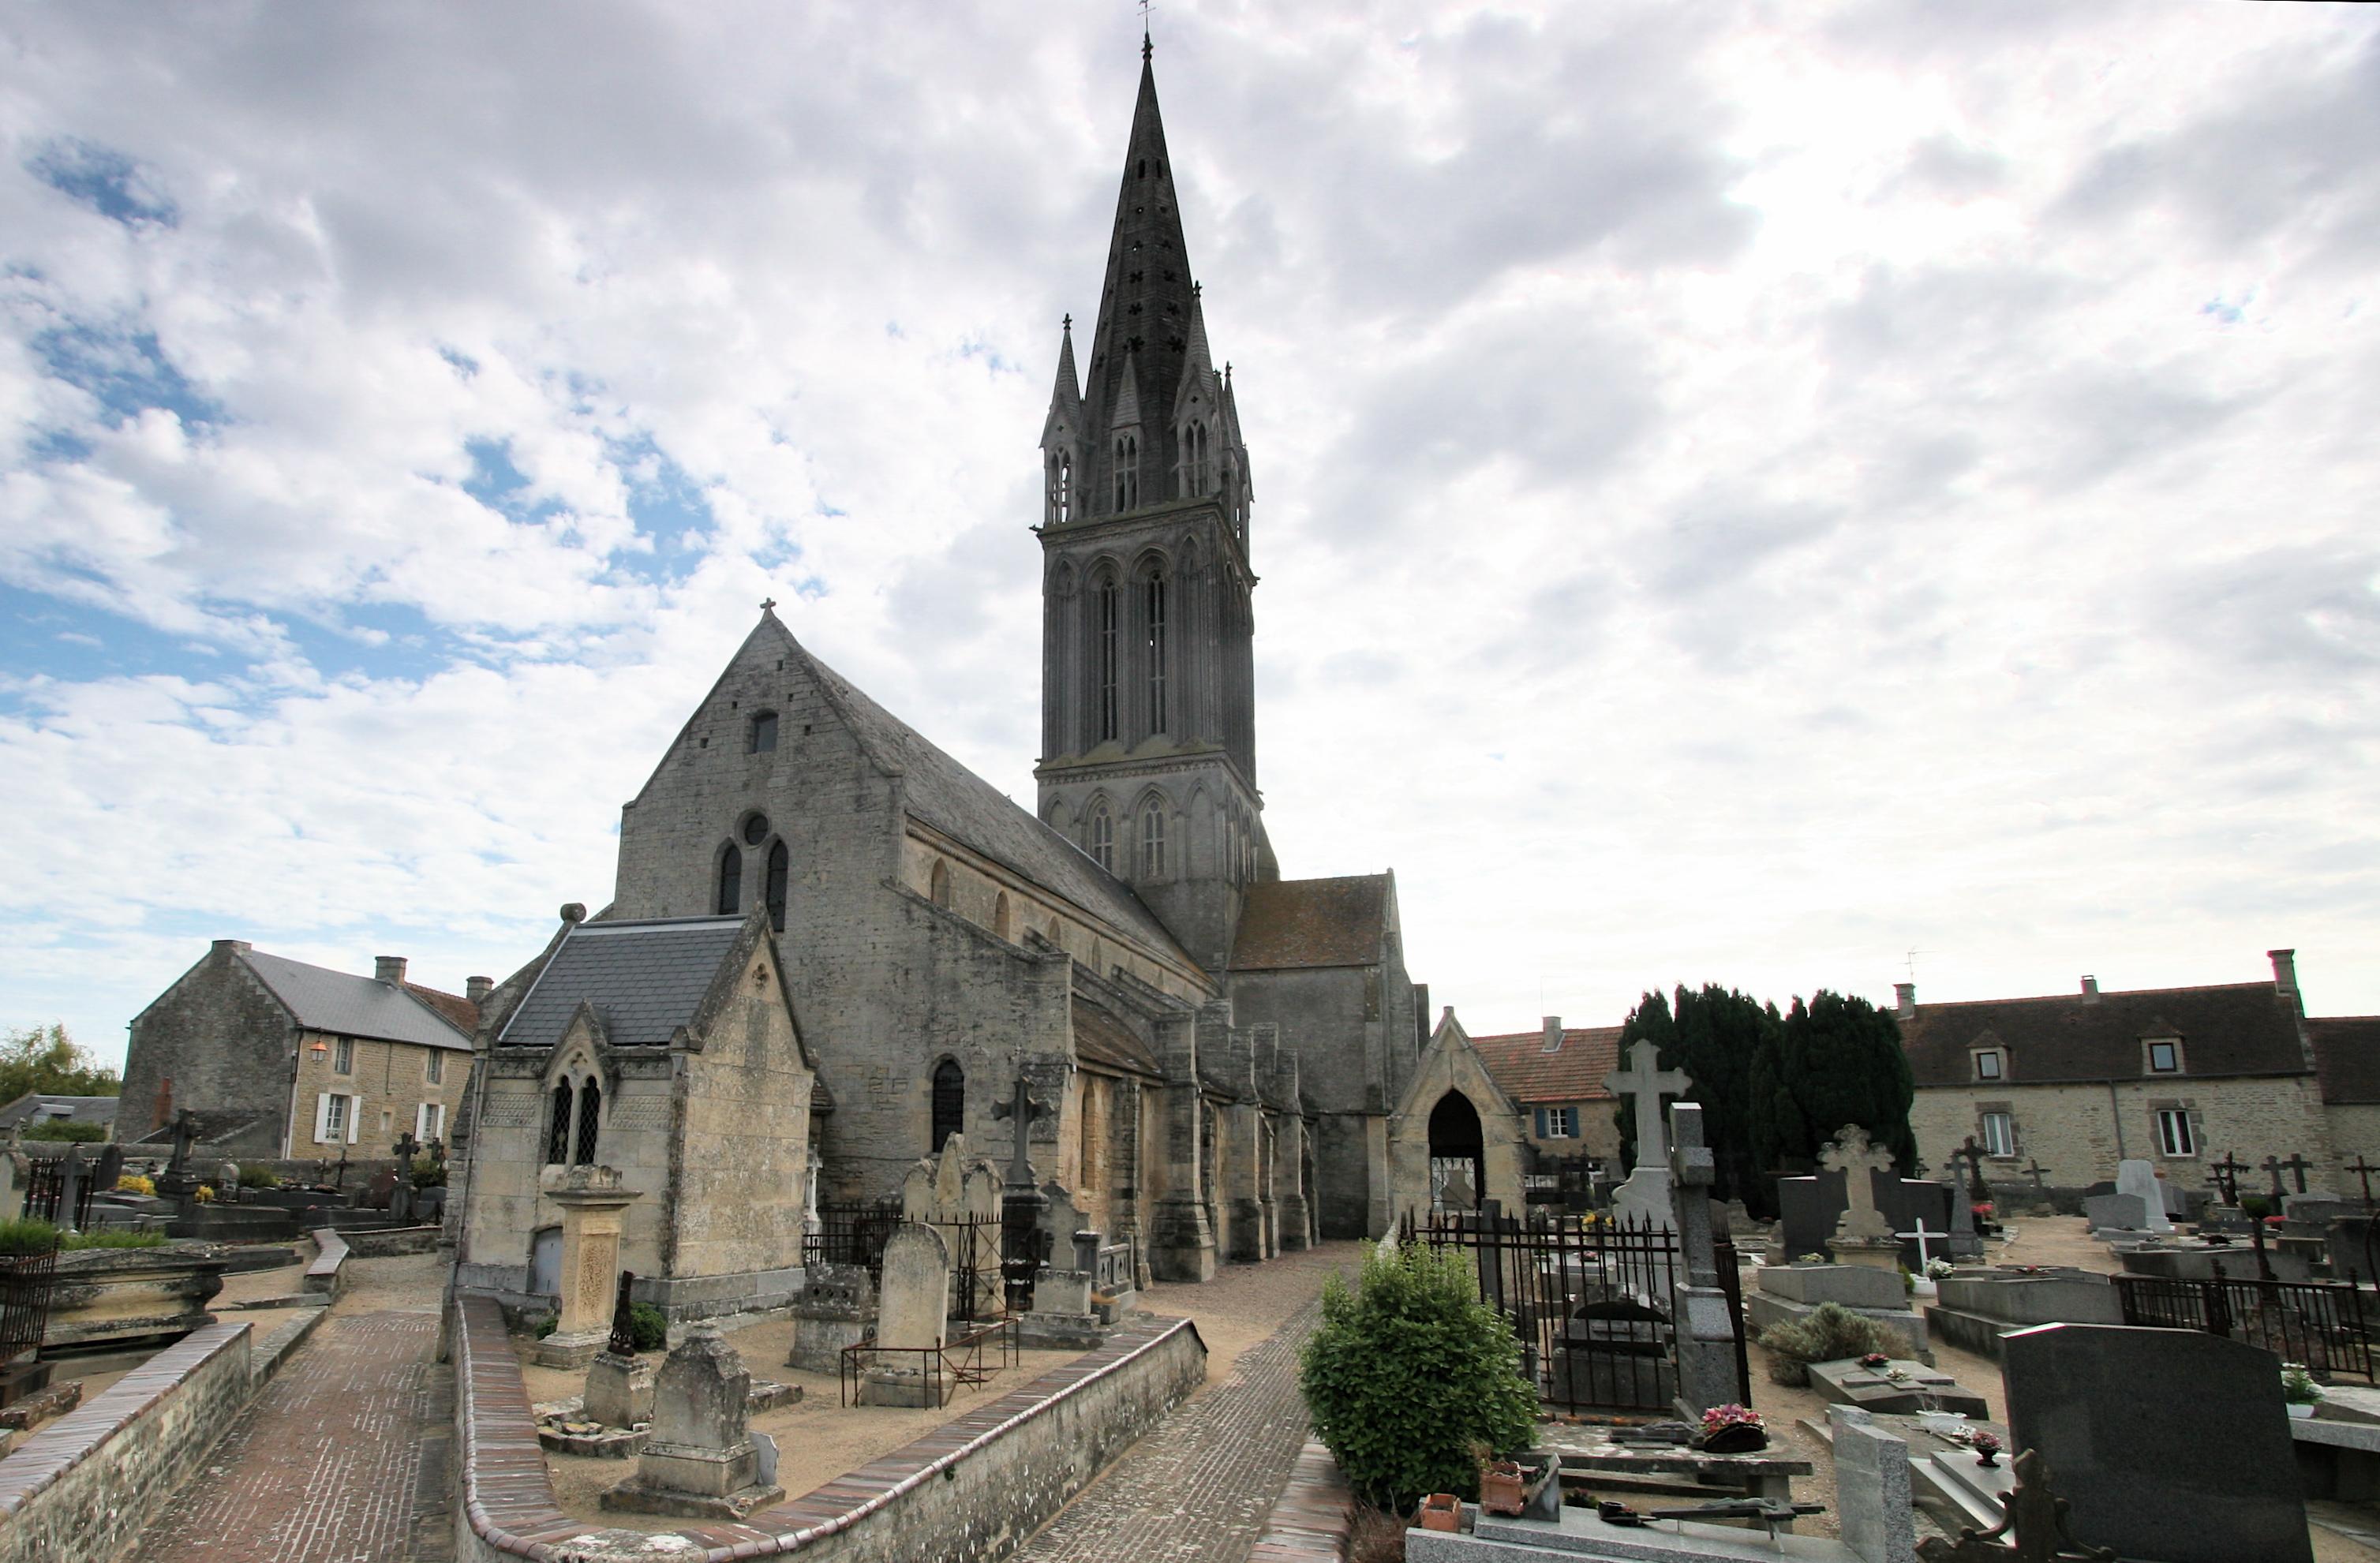 Eglise de Langrune sur Mer, Calvados, France